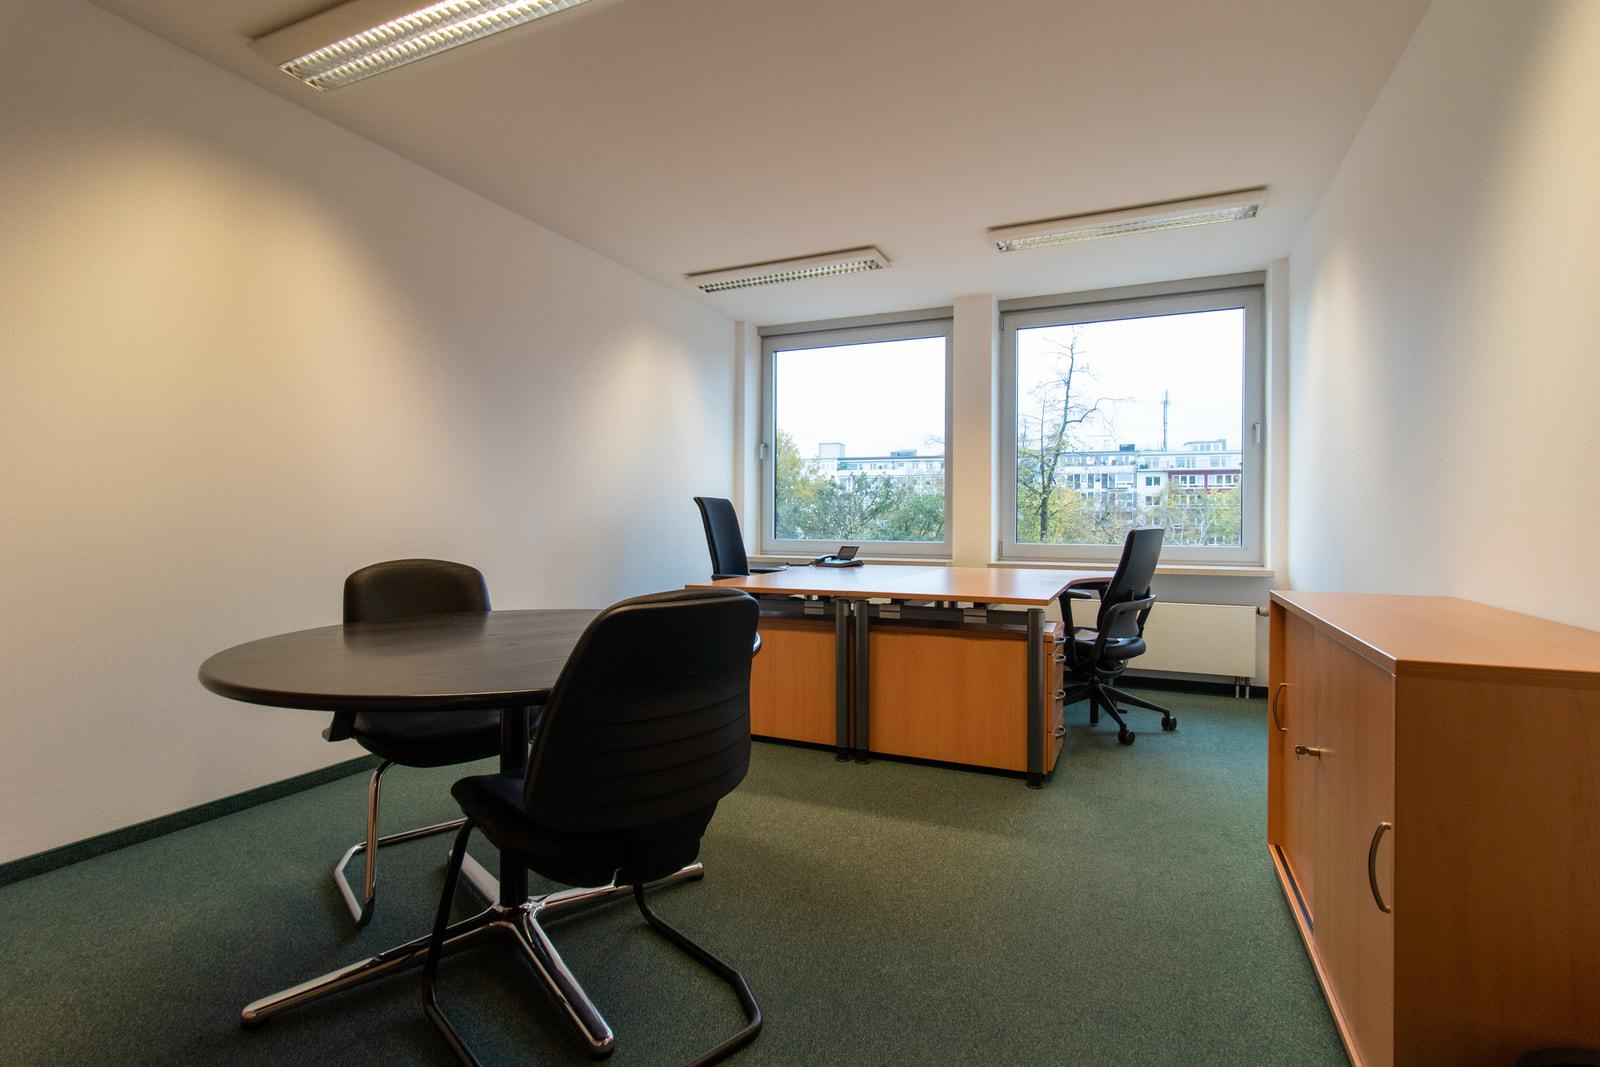 office 6 Theodor-Heuss-Ring 23